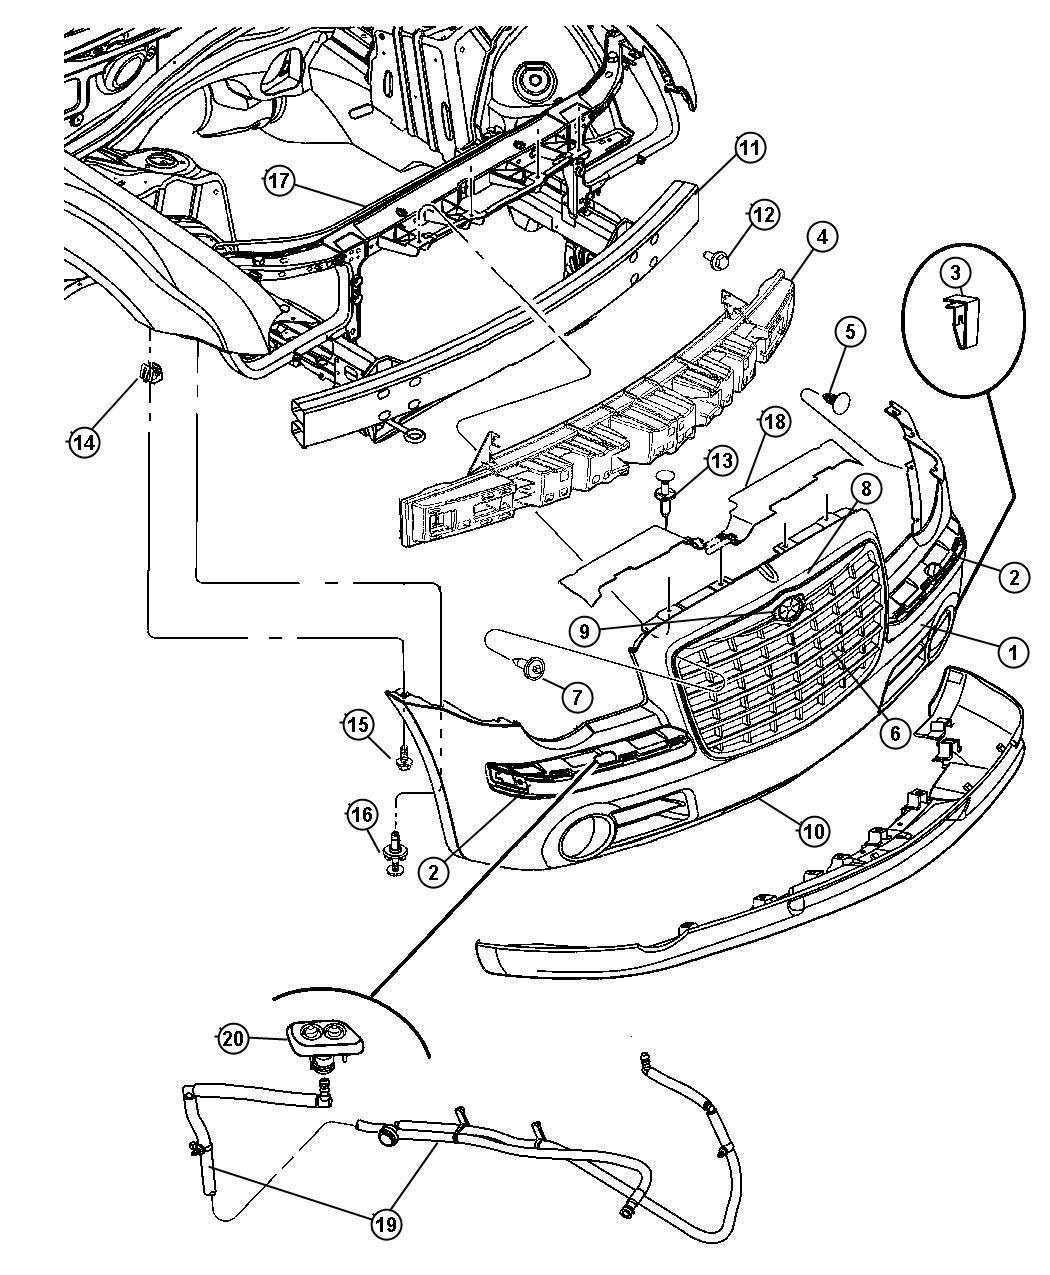 2006 Dodge Charger Panel. Closeout. Left. Displayheadlamp